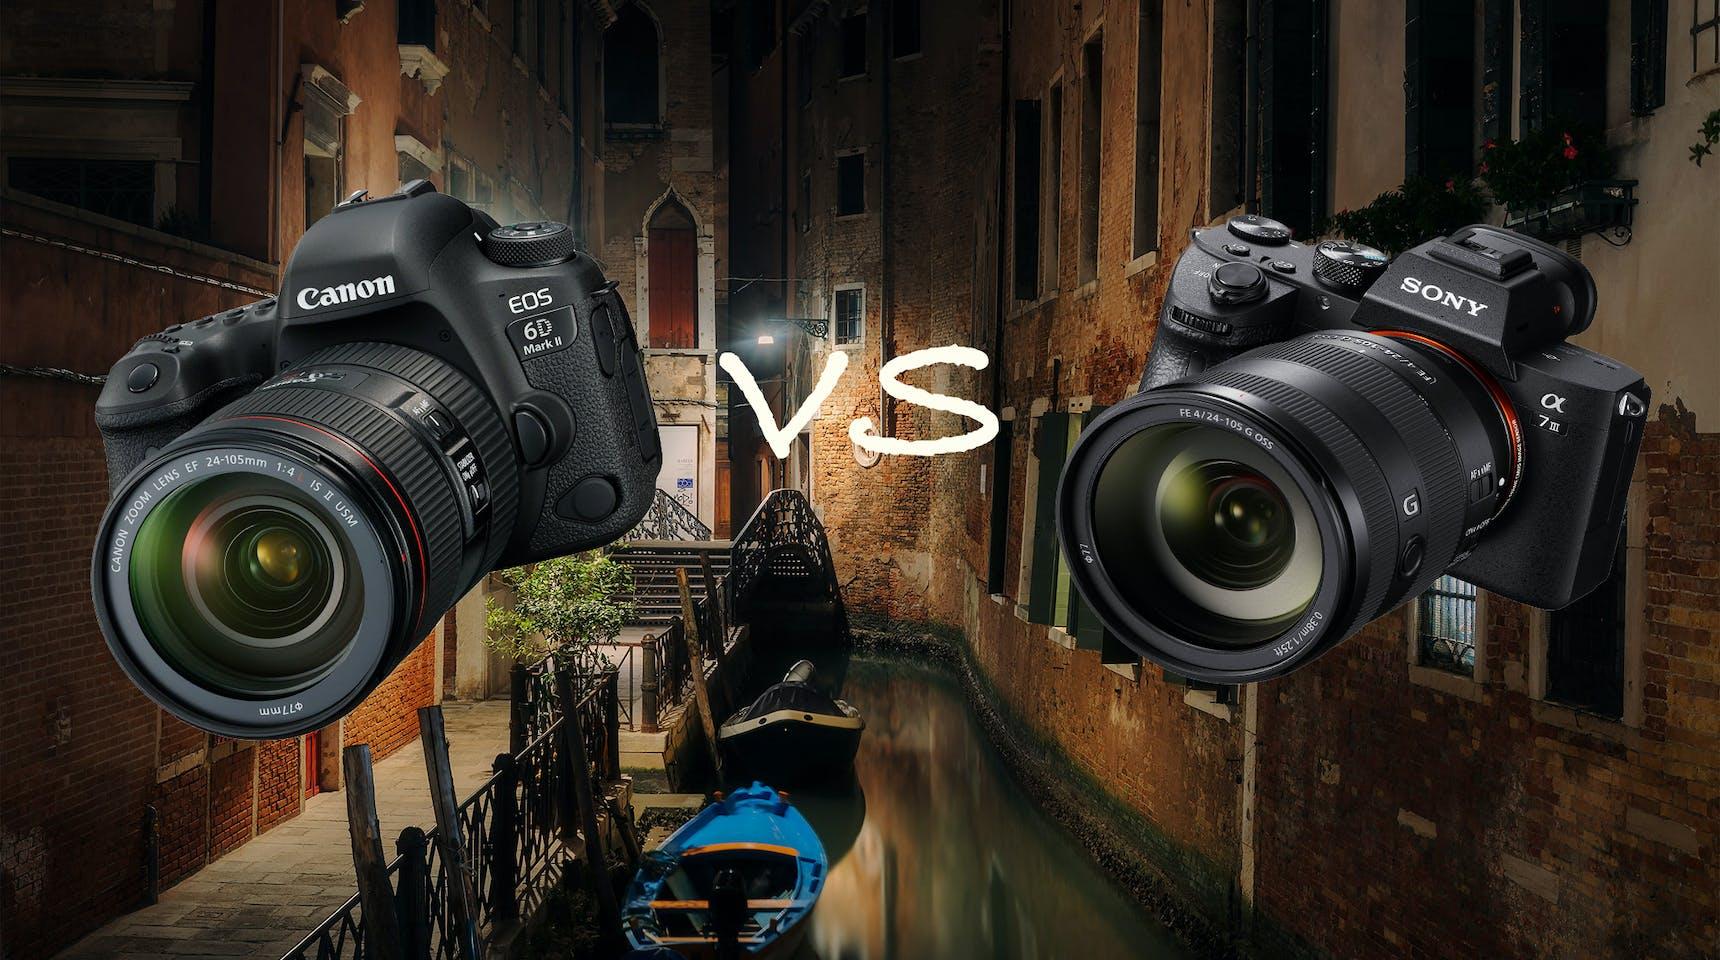 Dslr Vs Mirrorless Cameras For Landscape Photography